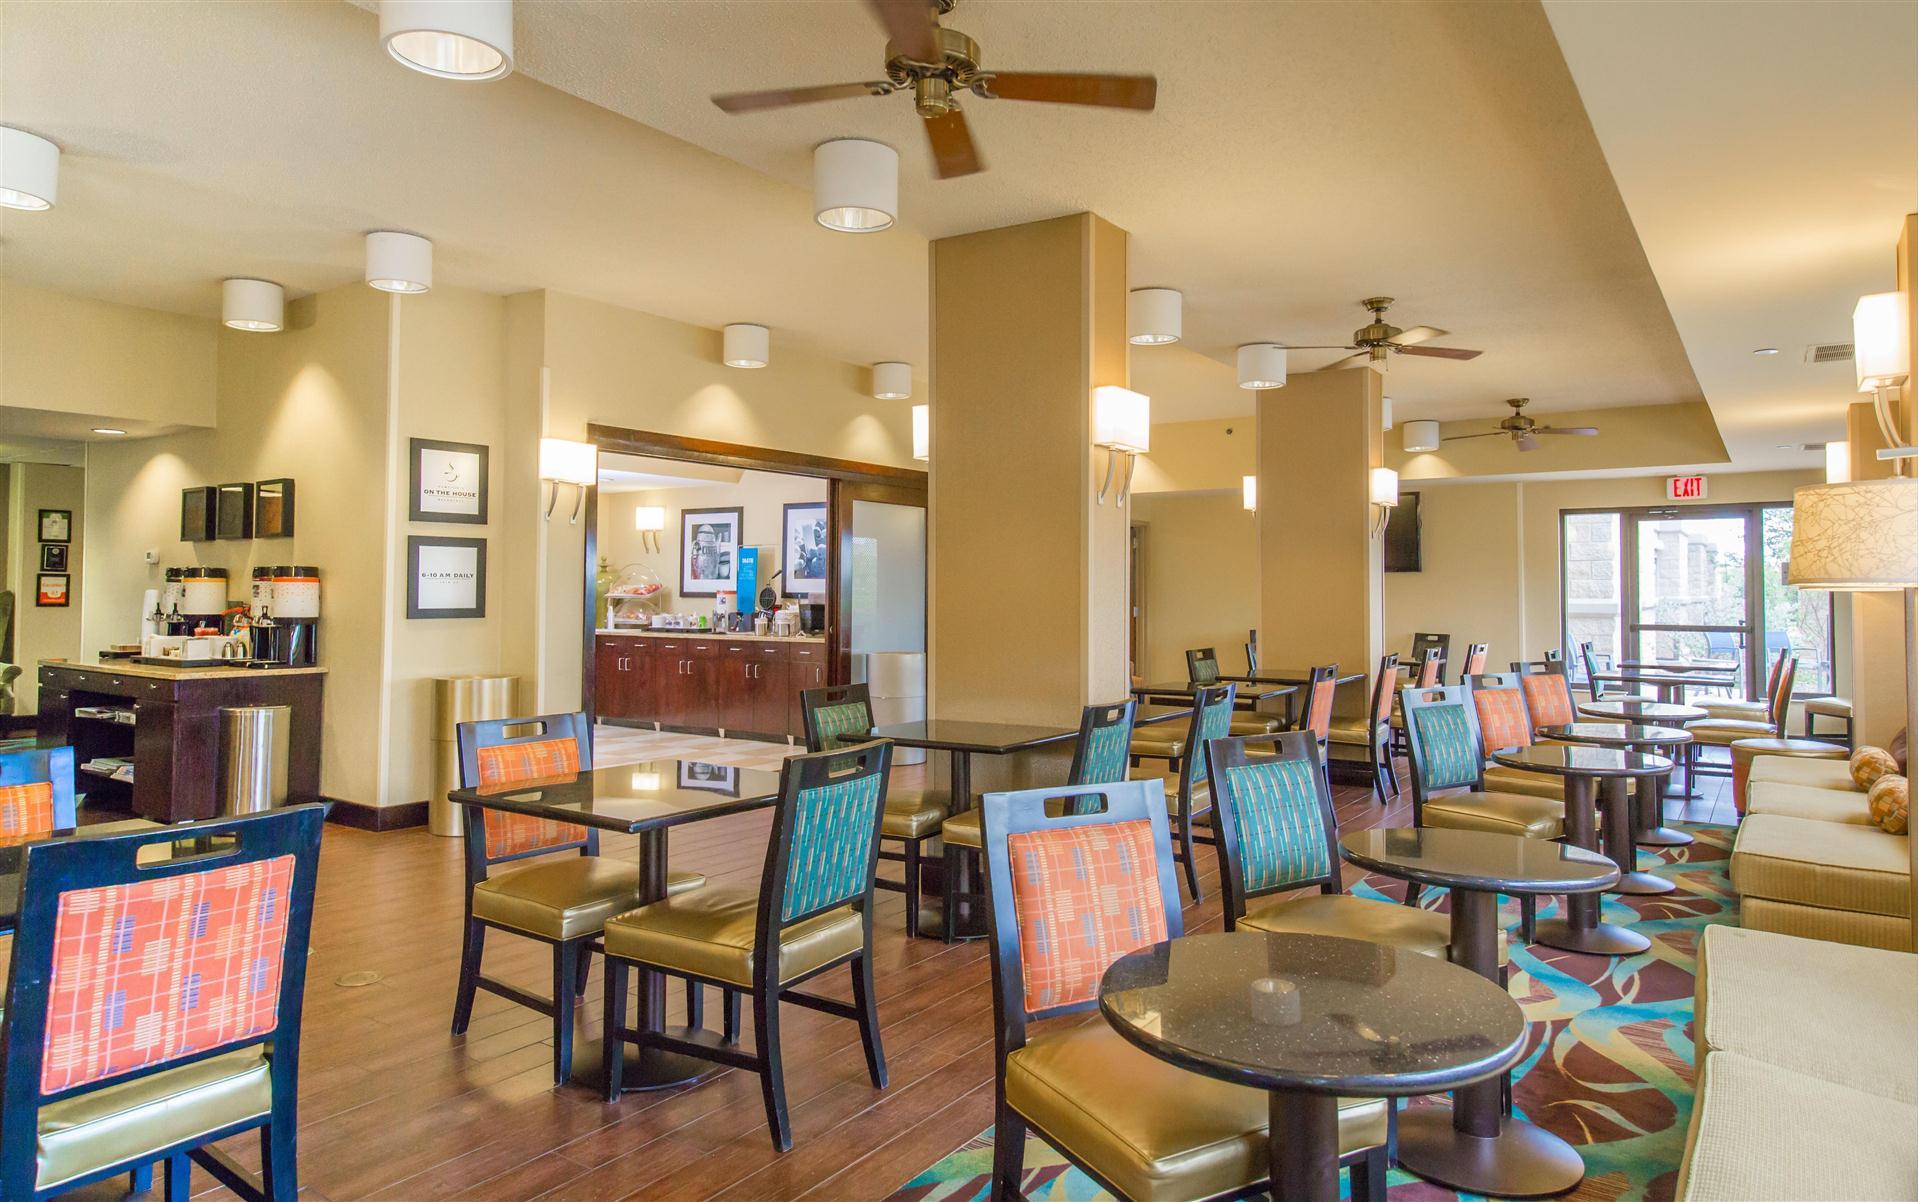 Meetings and Events at Hampton Inn Dallas-Irving-Las Colinas, Irving ...